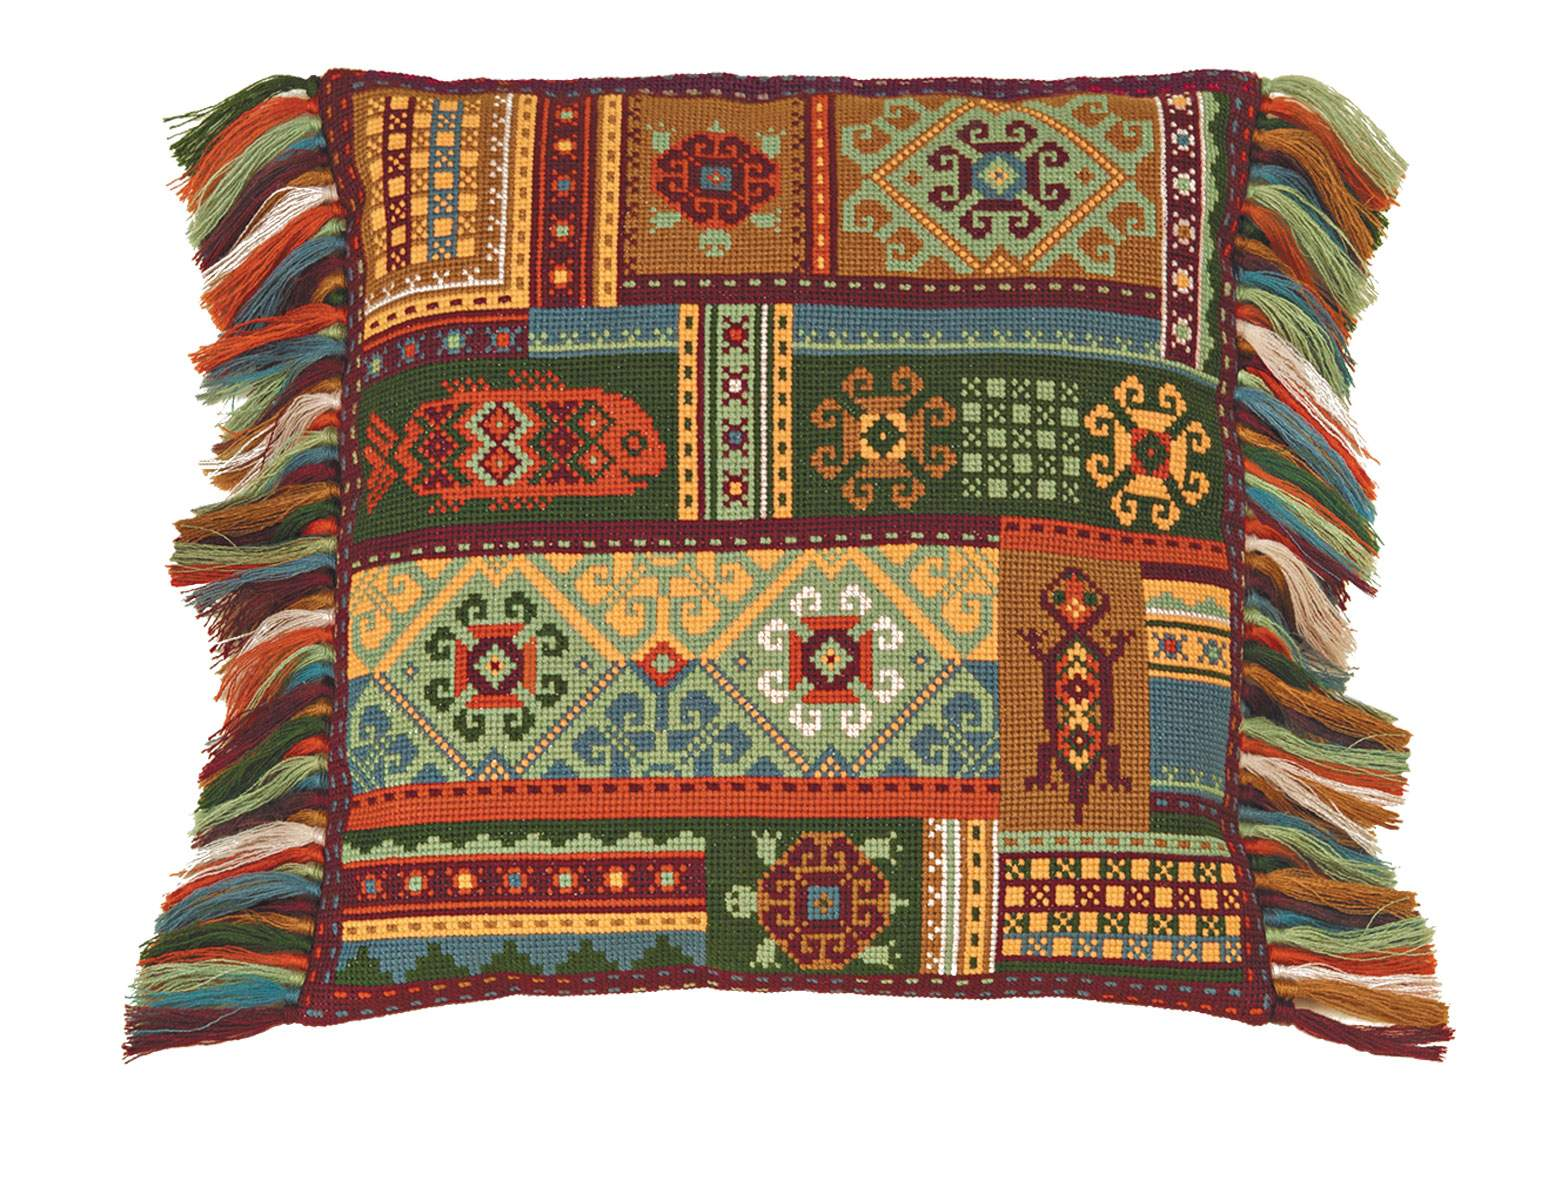 RIOLISクロスステッチ刺繍キット No.1483「Terra Cushion」 (テラ クッション 40cm角) 【海外取り寄せ/納期30~60日程度】